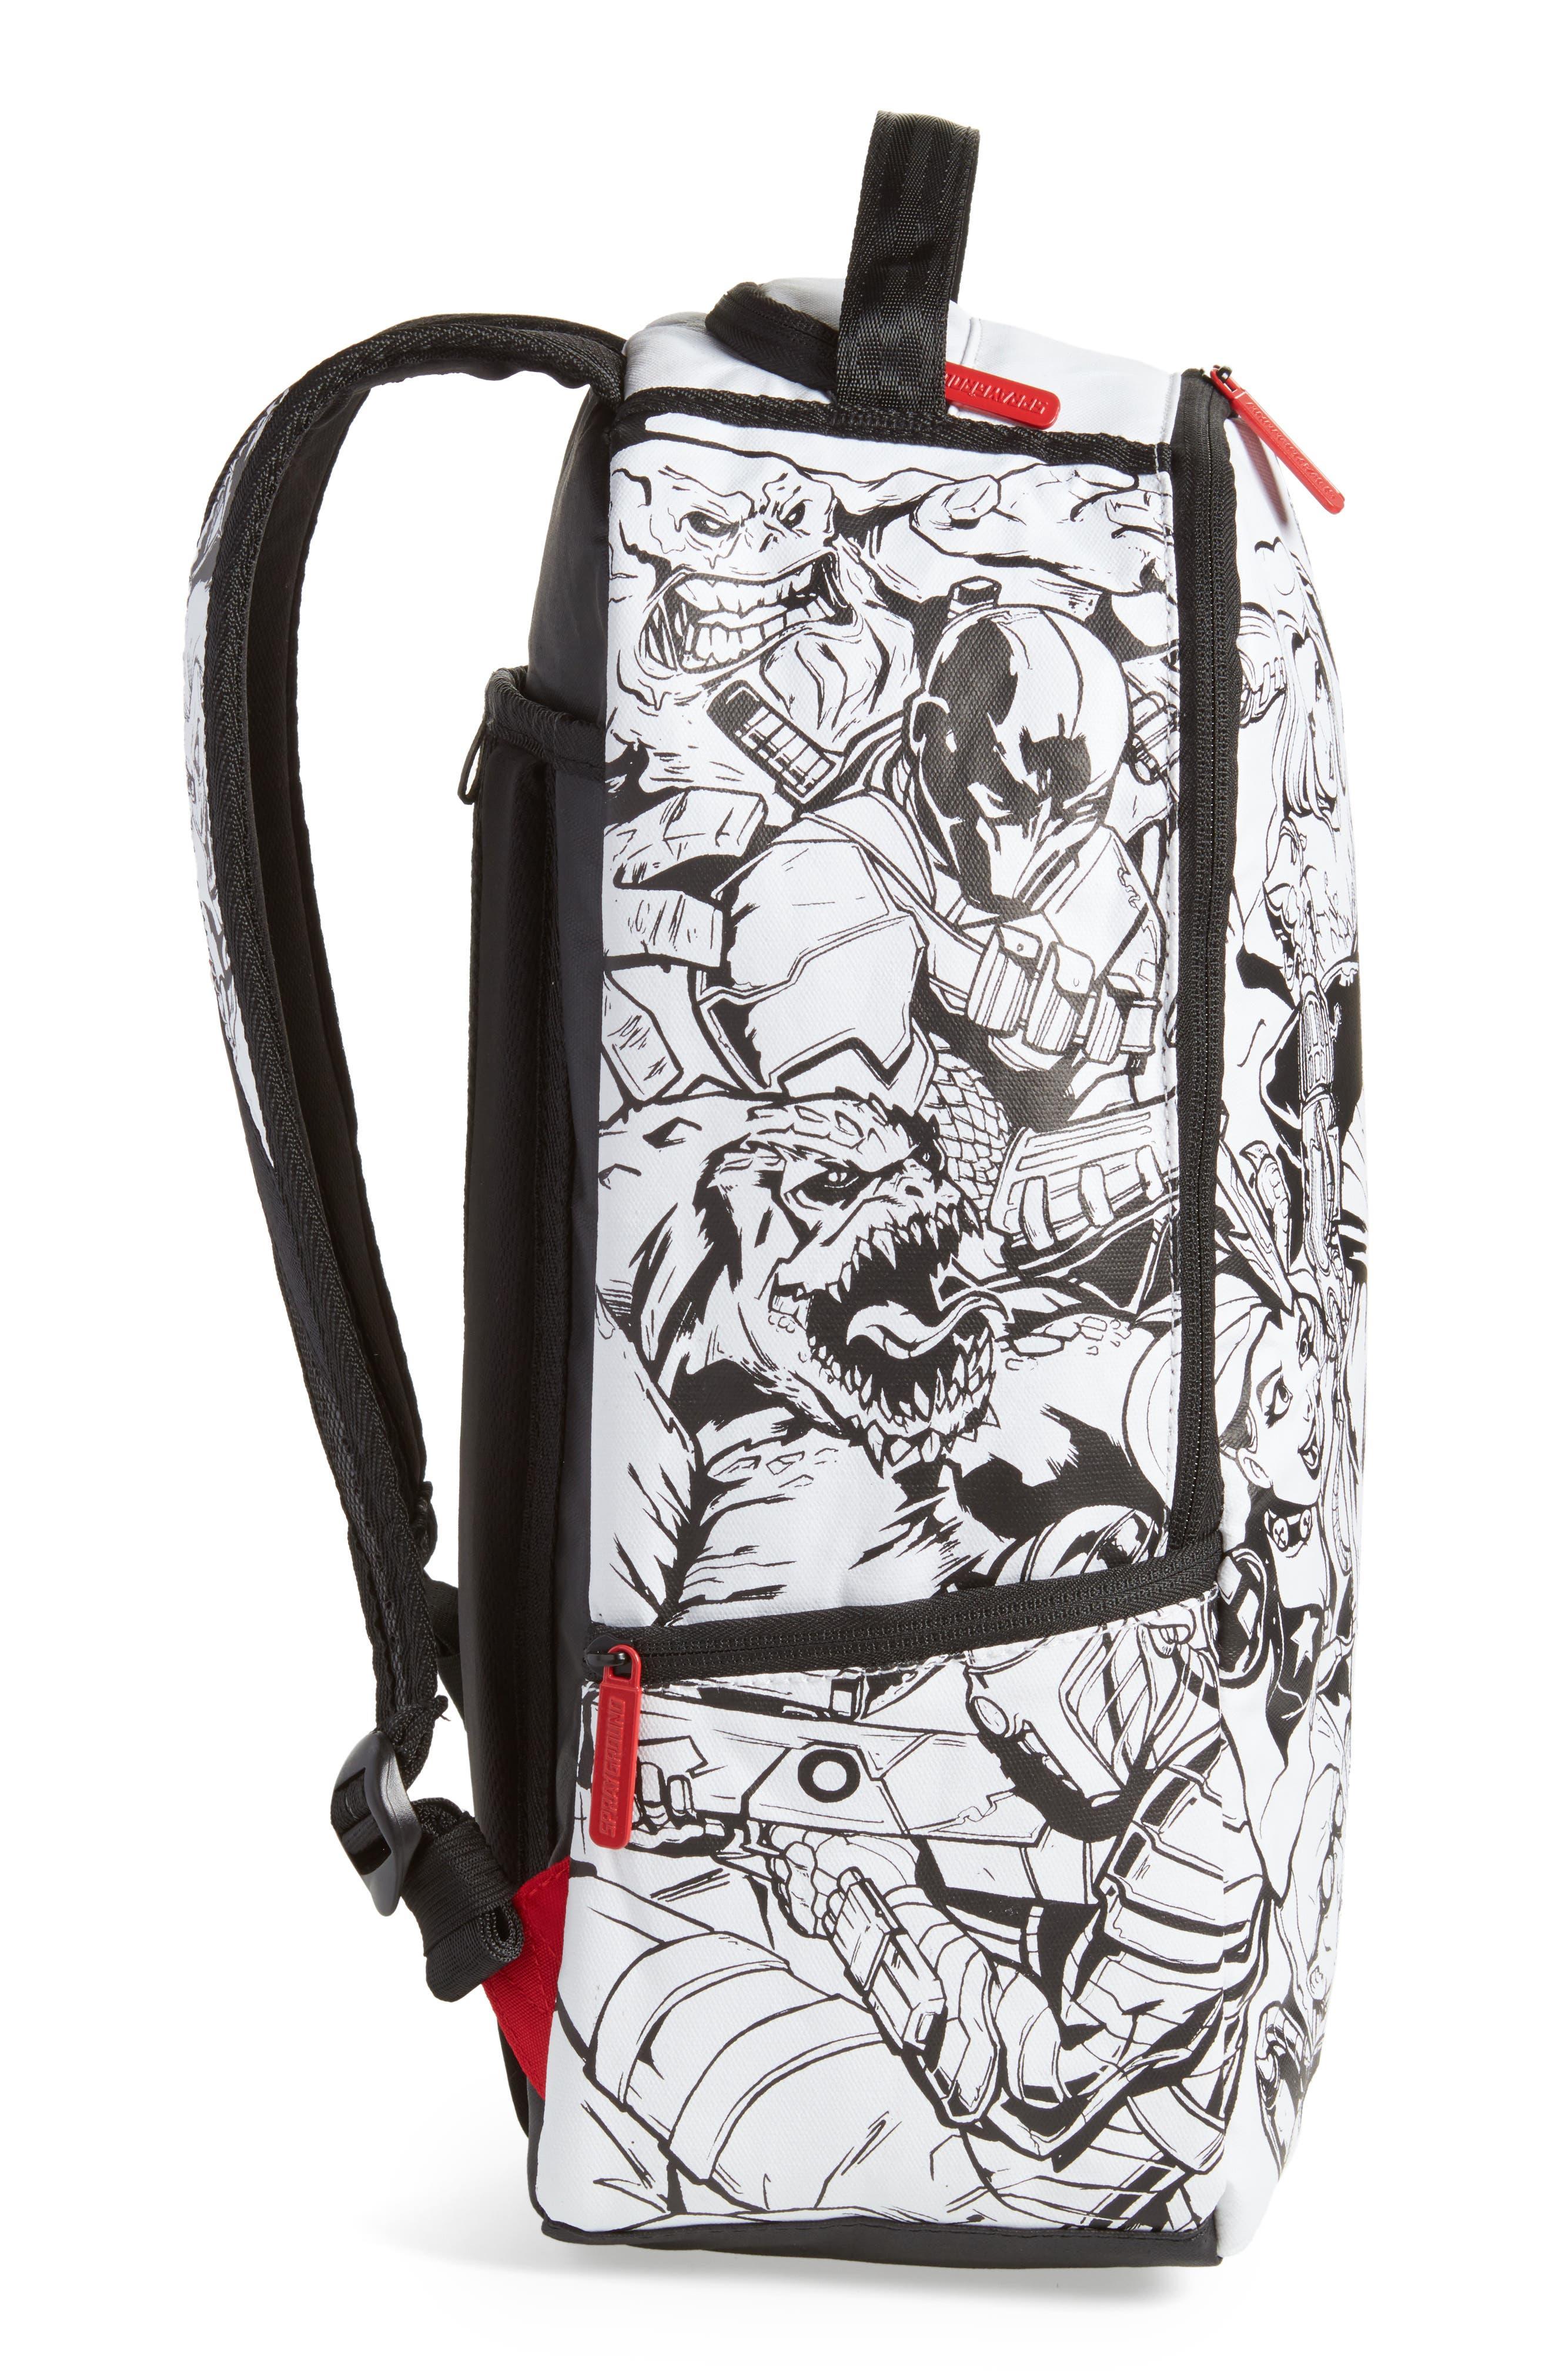 Batman DIY Villains Backpack,                             Alternate thumbnail 5, color,                             Black/ White